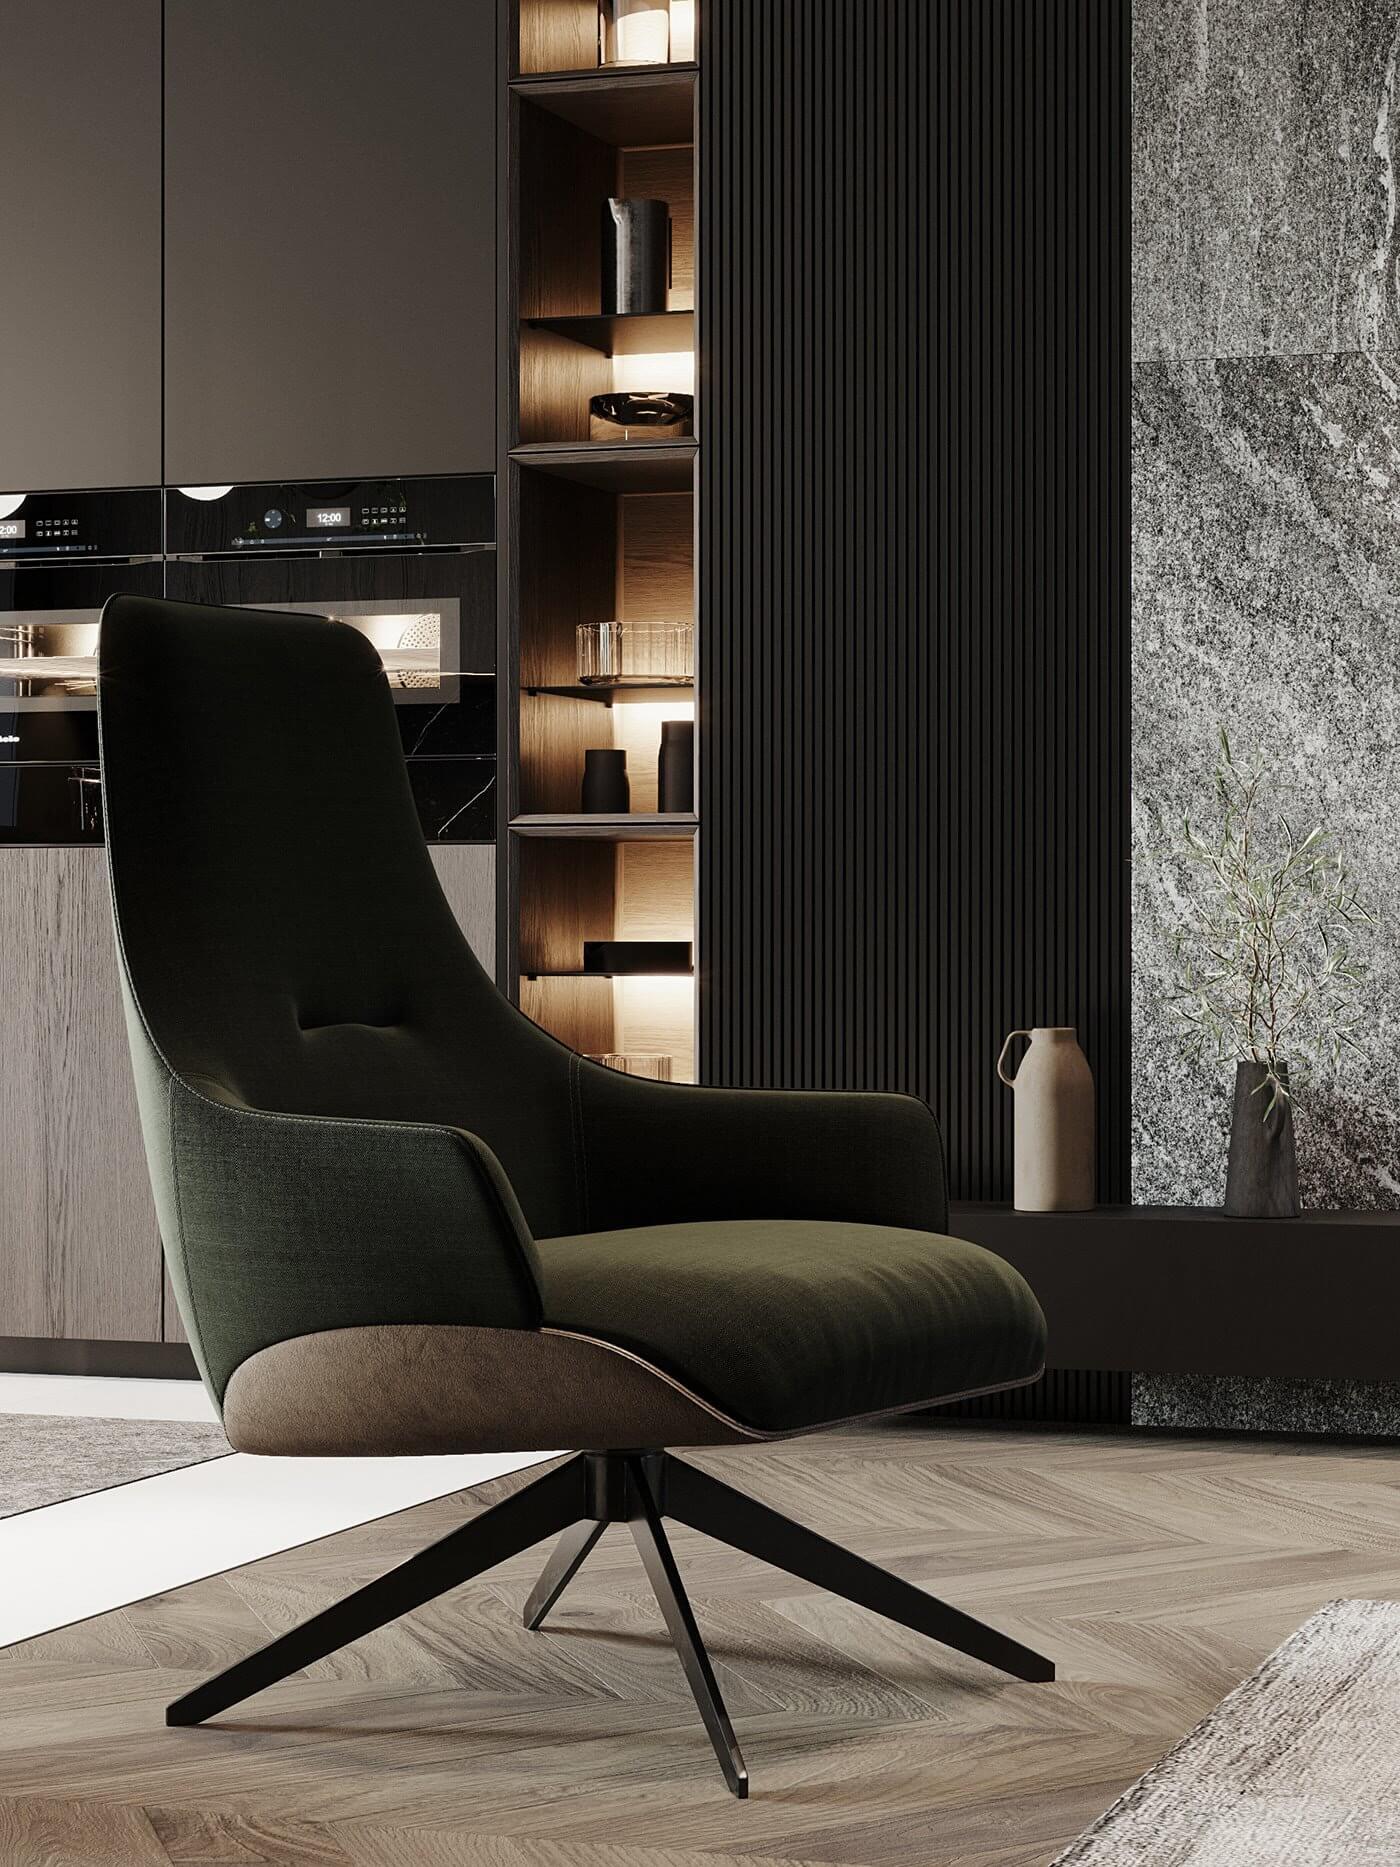 Dark living Apartment living room lounge chair - cgi visualization